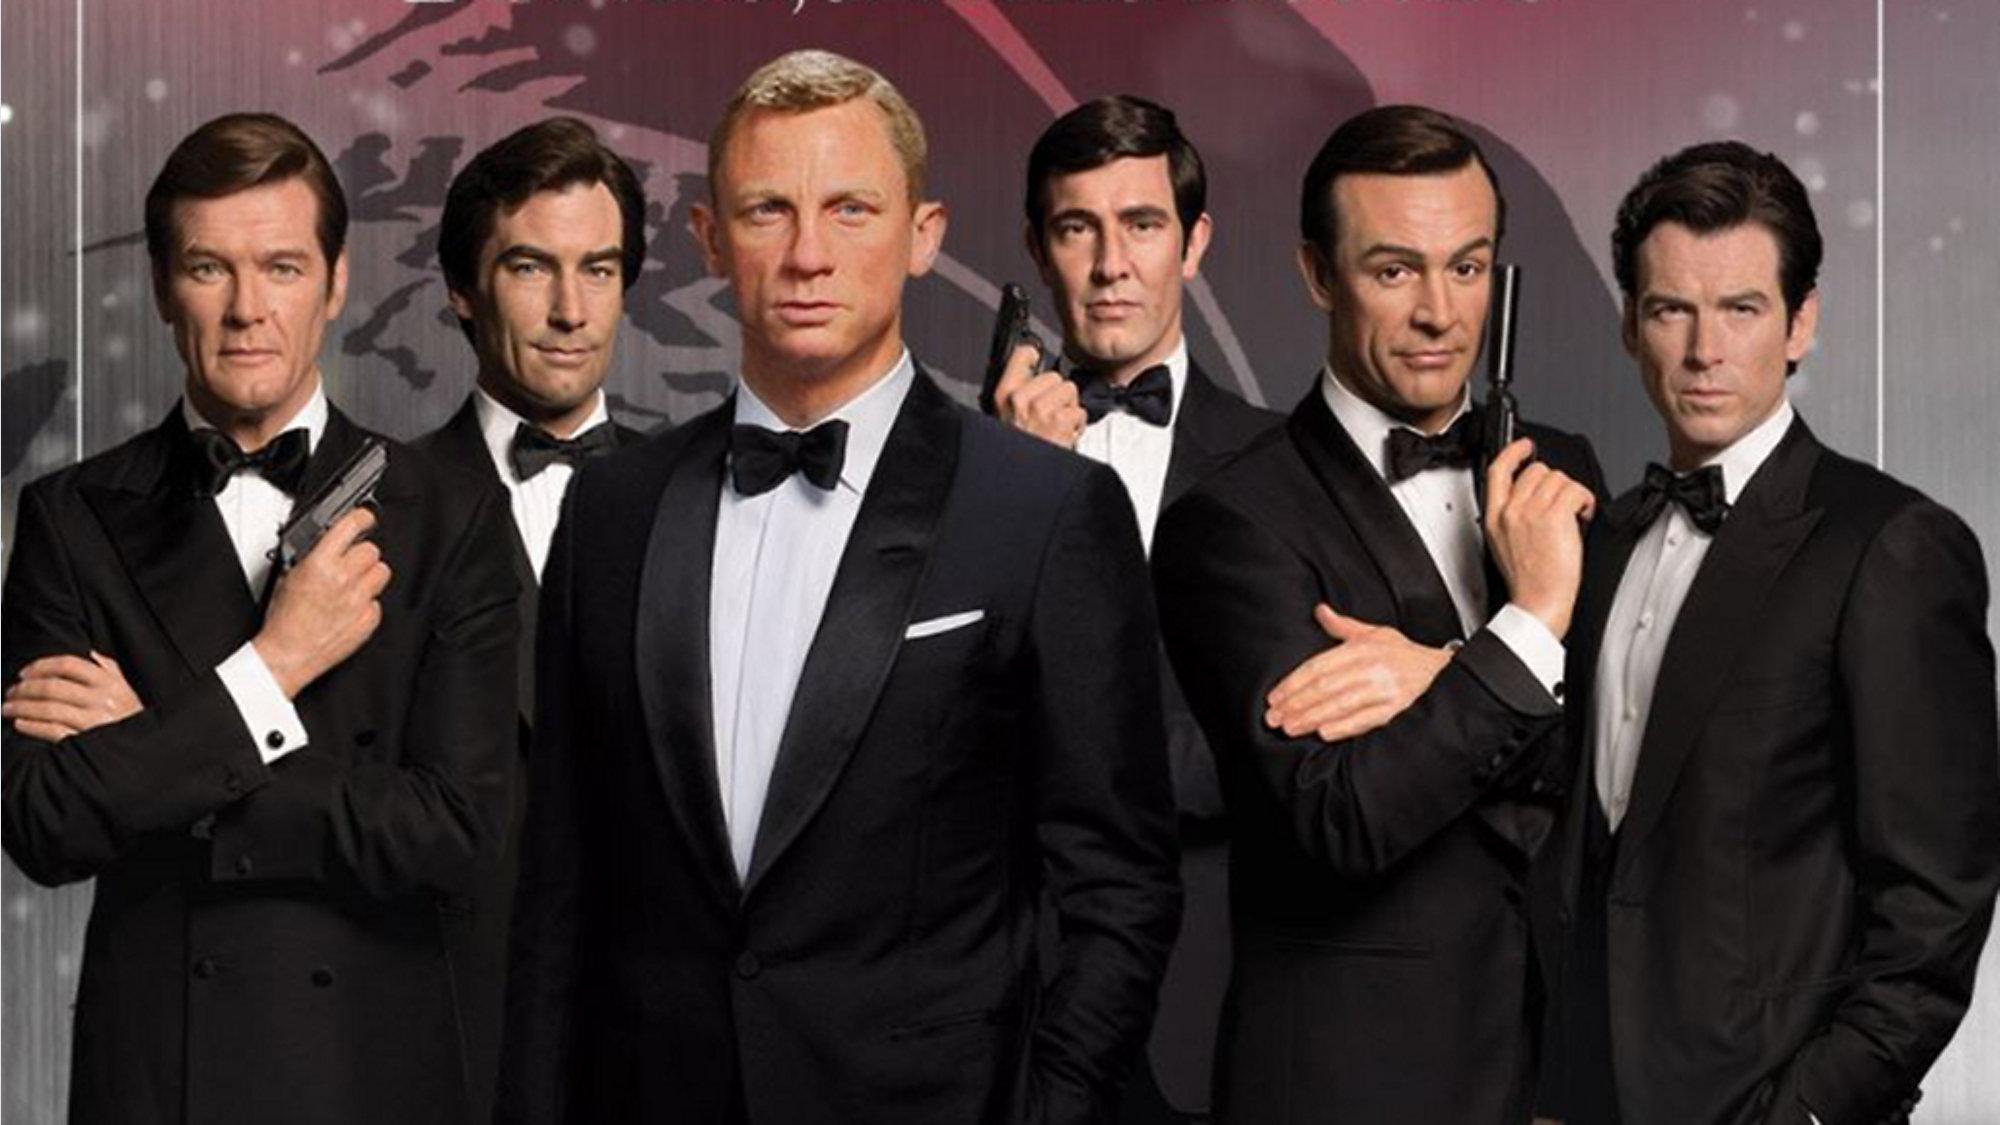 Madame Tussauds Orlando To Unveil James Bond Wax Figures